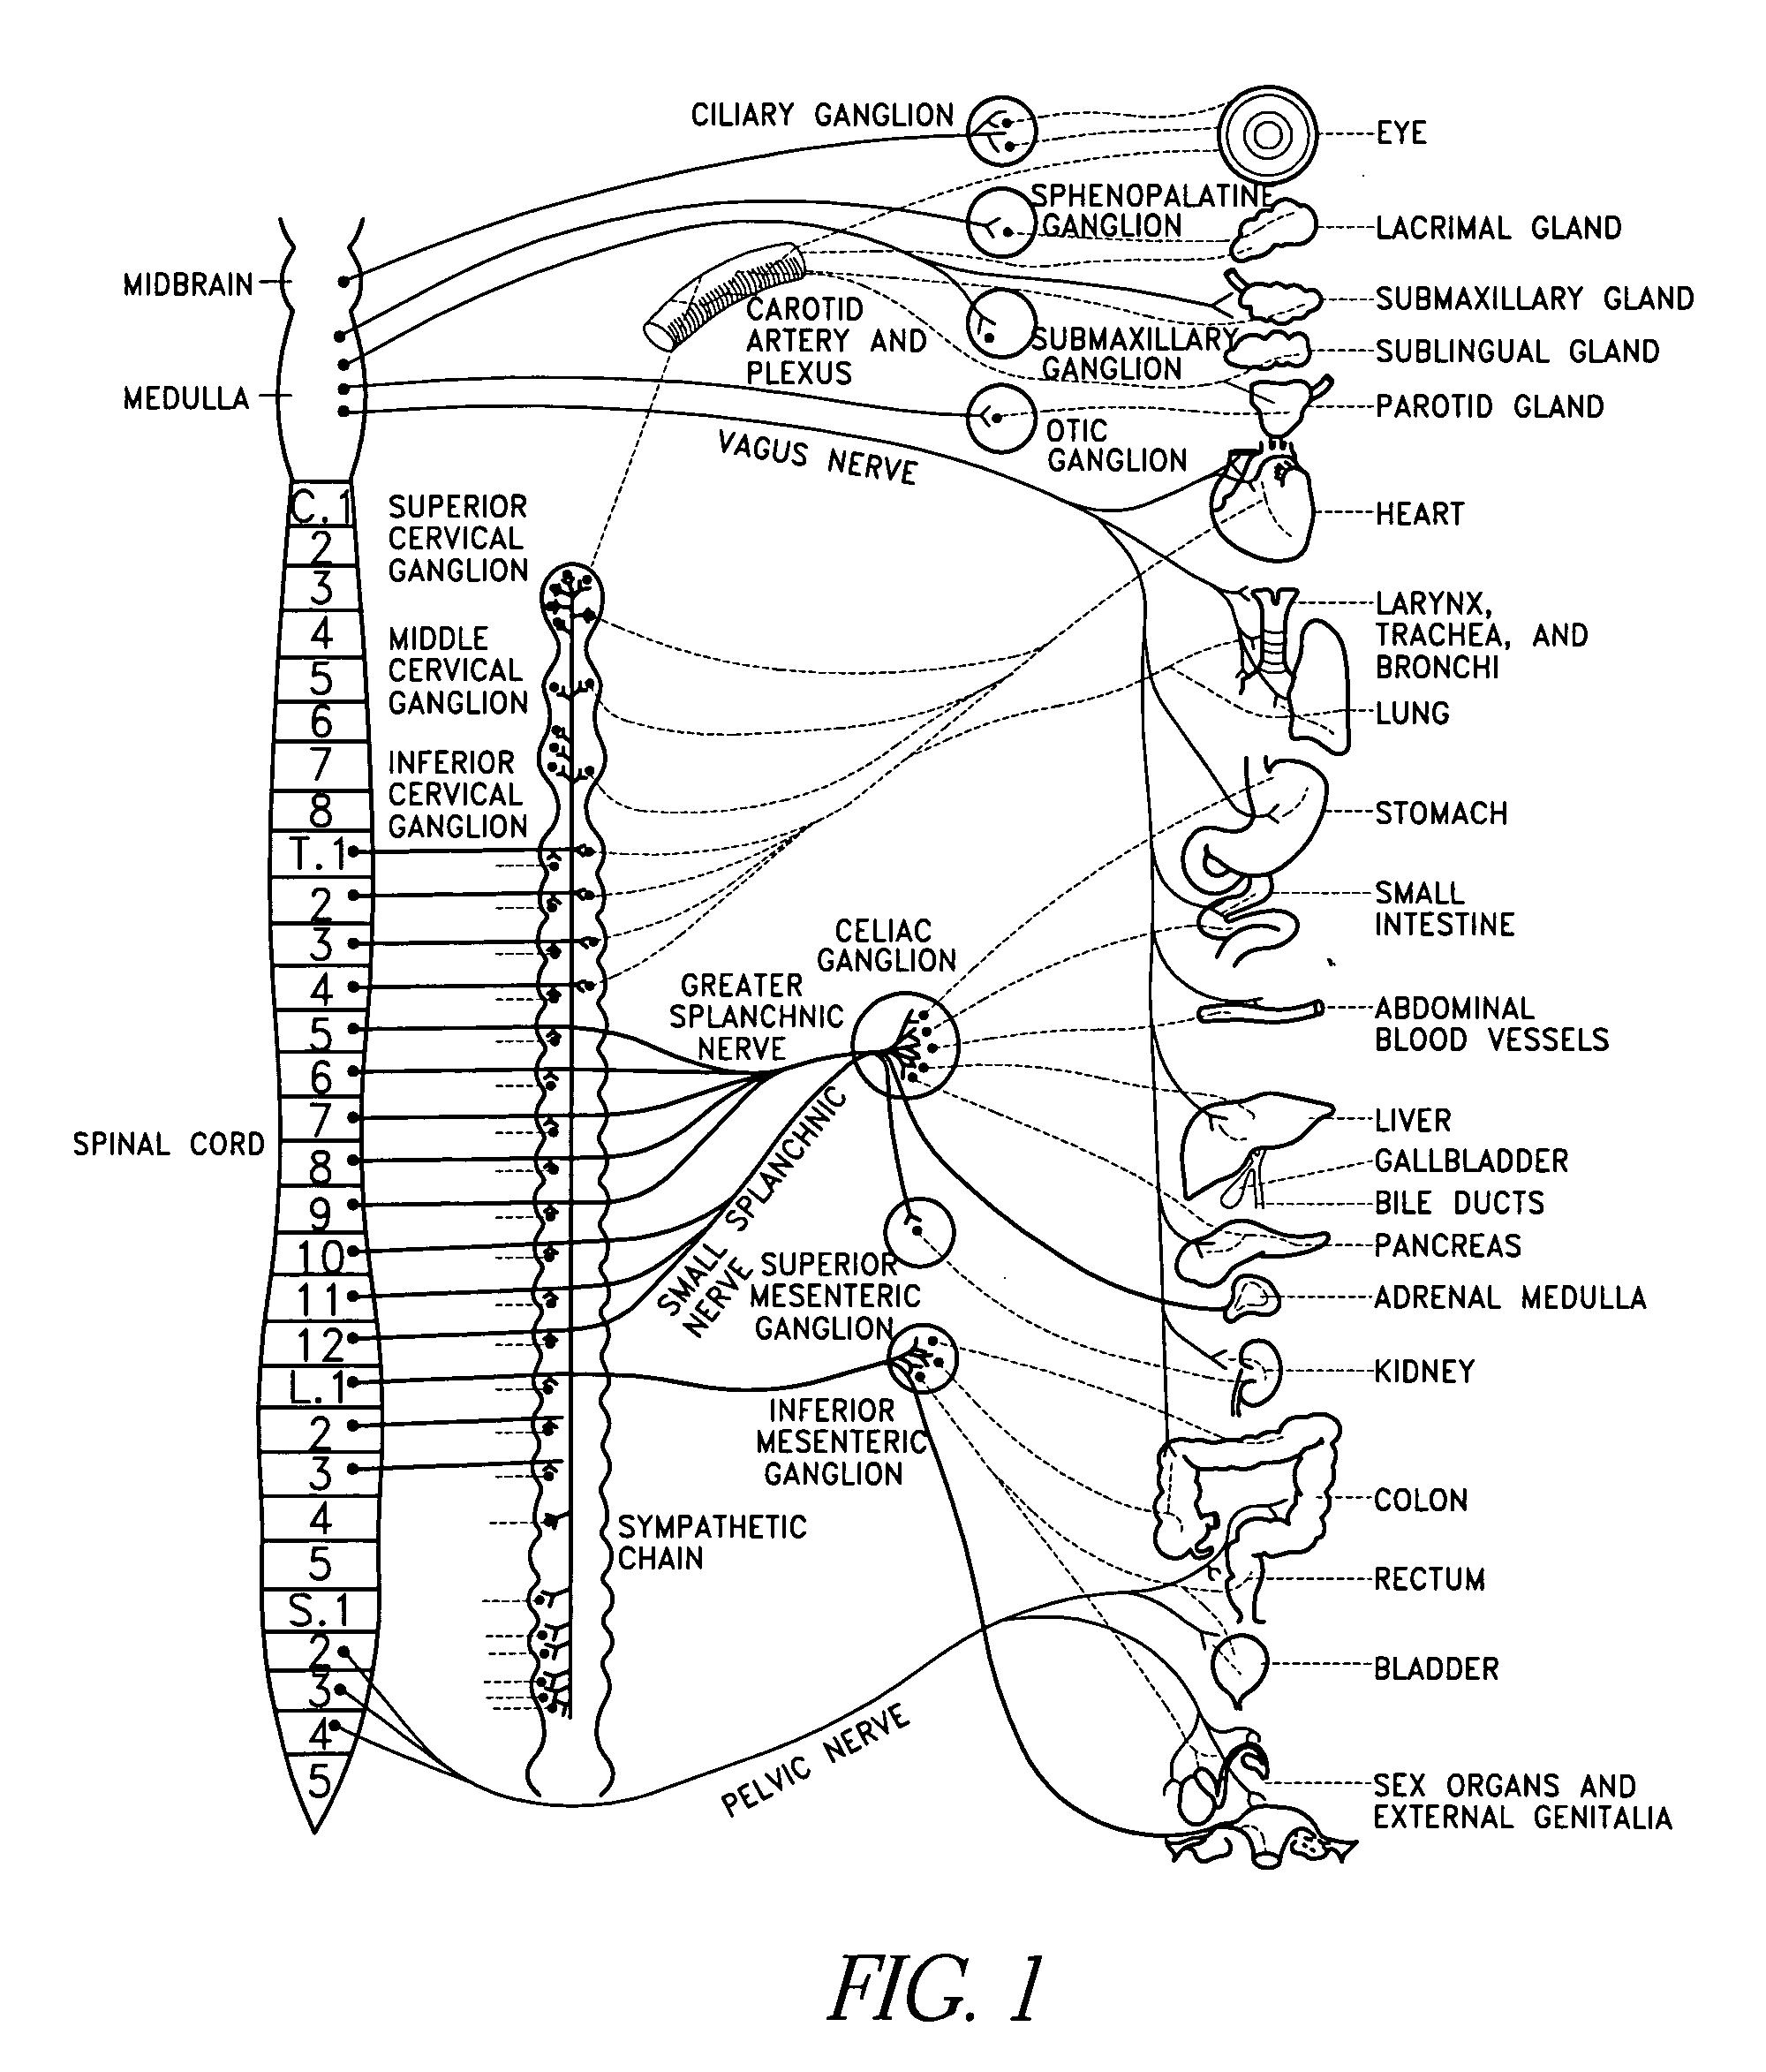 Patent US7239912 - Electric modulation of sympathetic nervous system - Google Patents